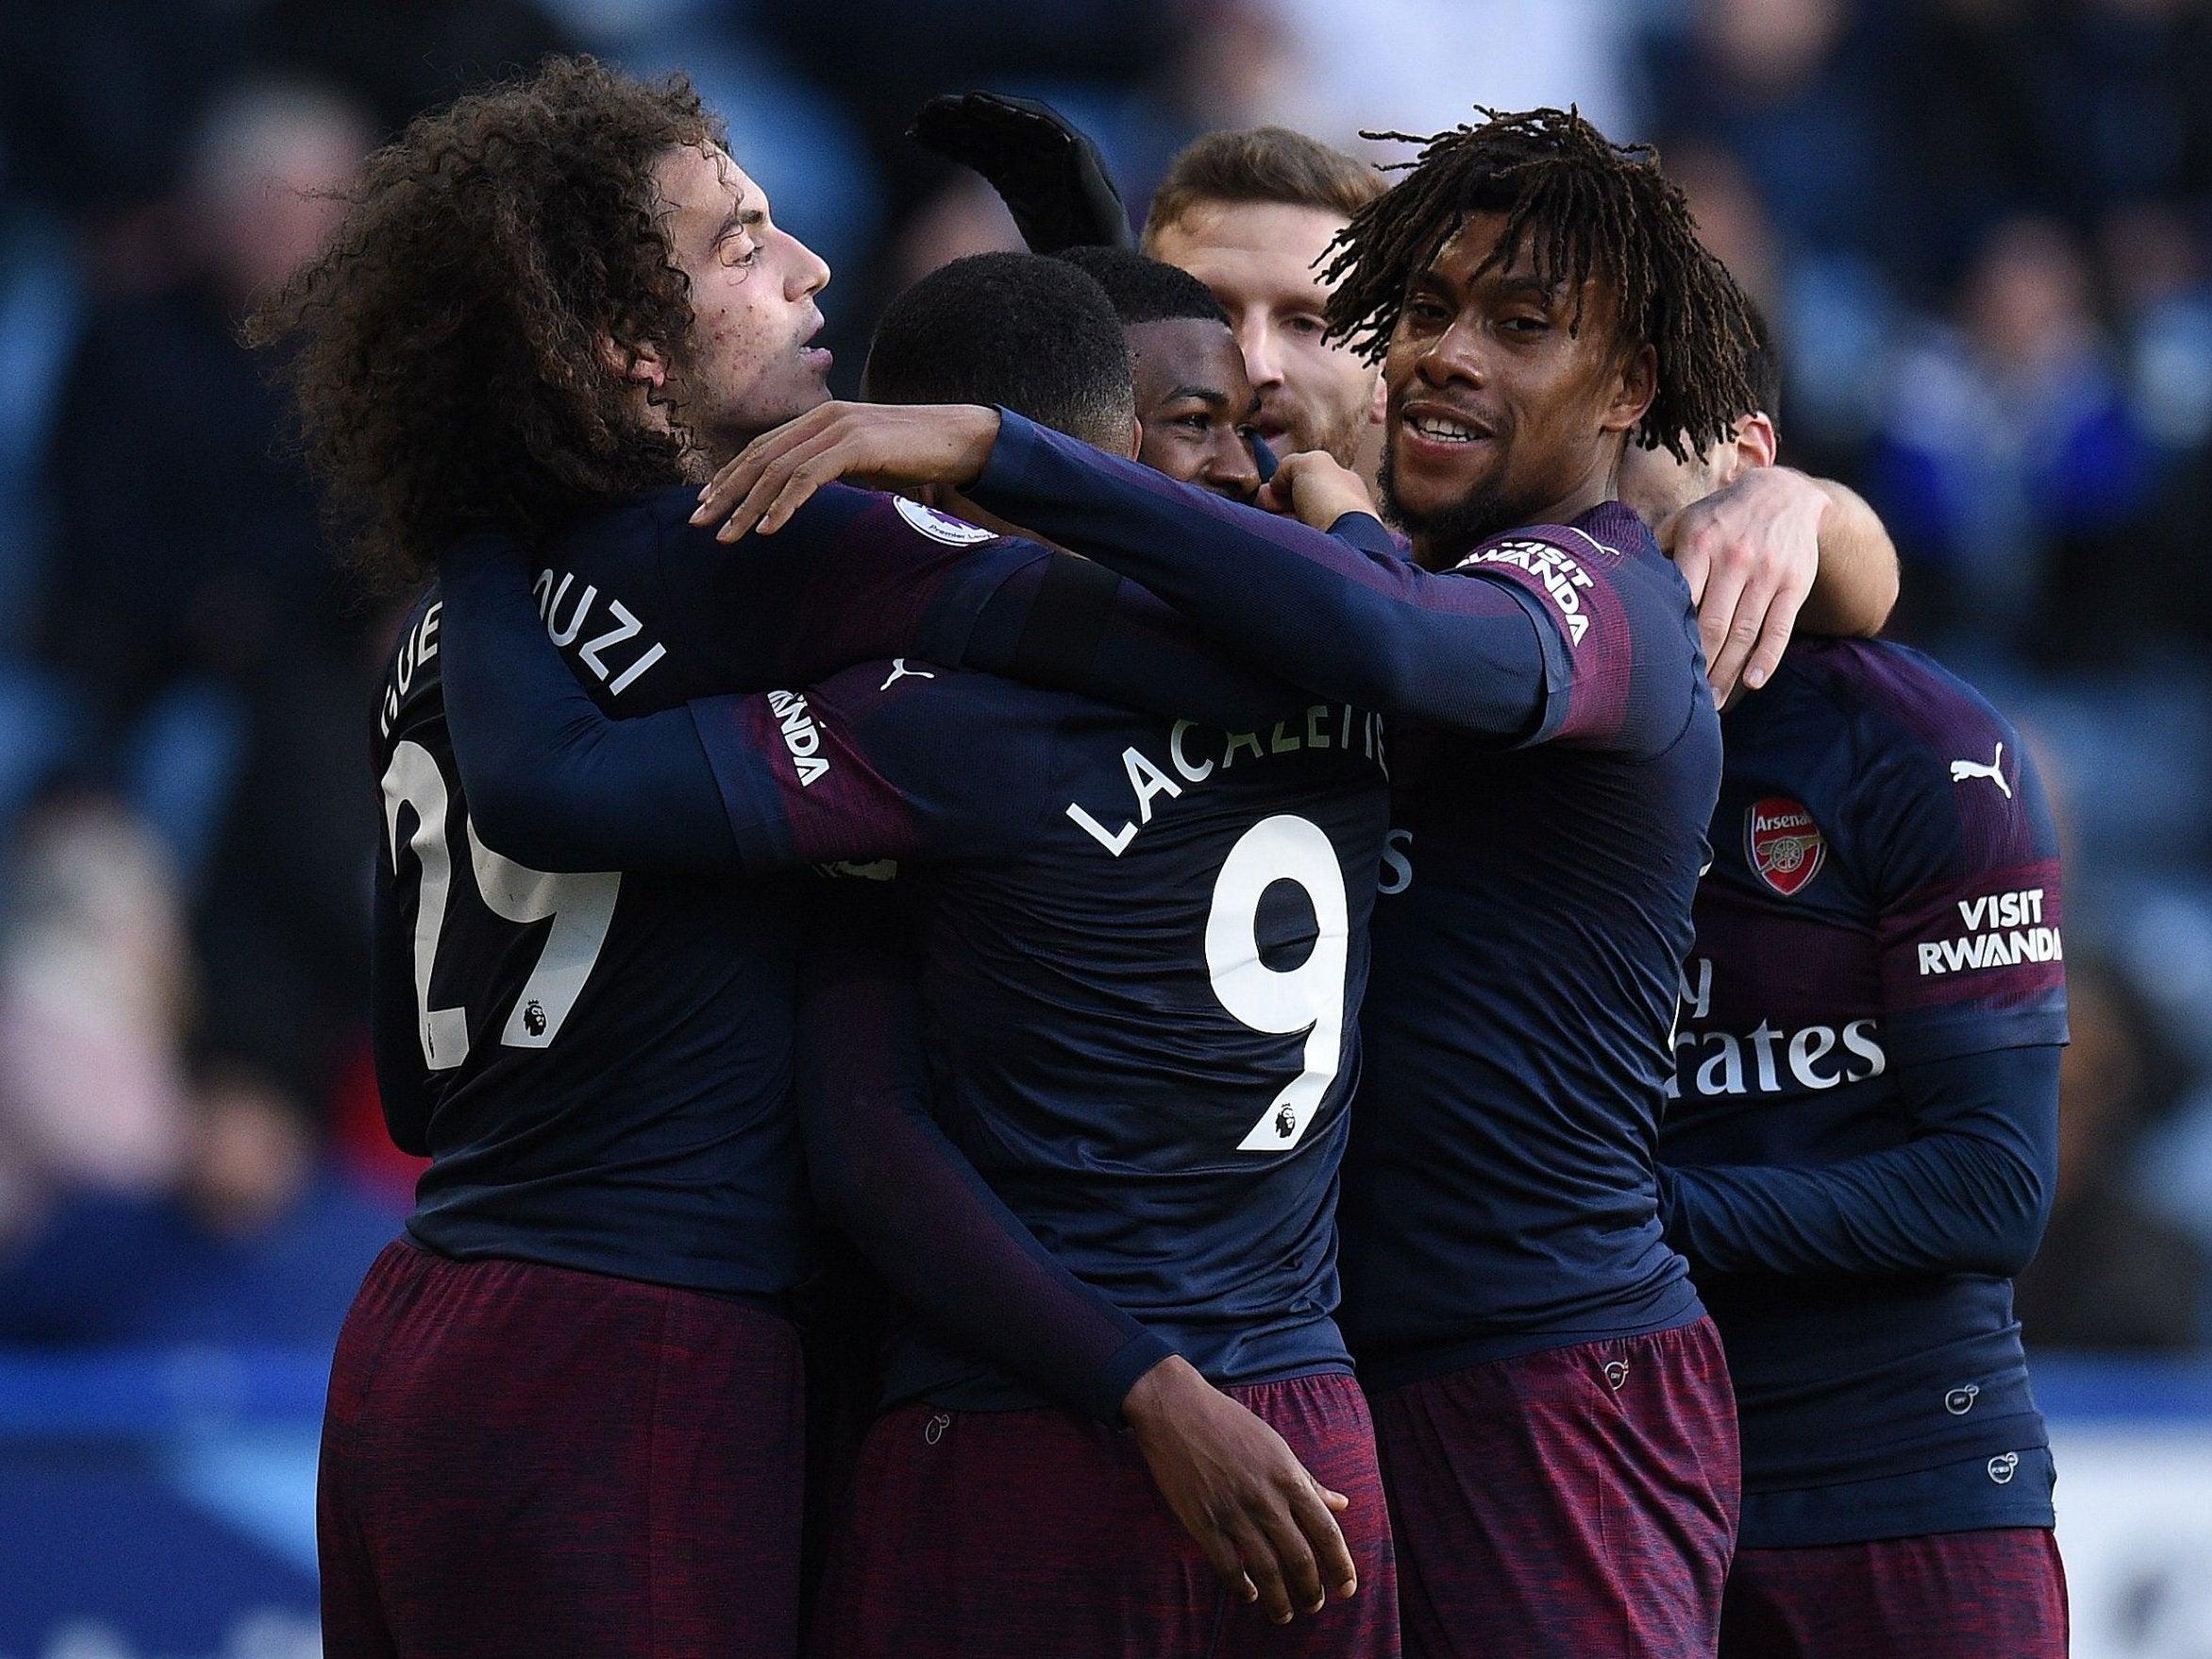 Huddersfield Vs Arsenal: Huddersfield 1-2 Arsenal: Alex Iwobi And Alexandre